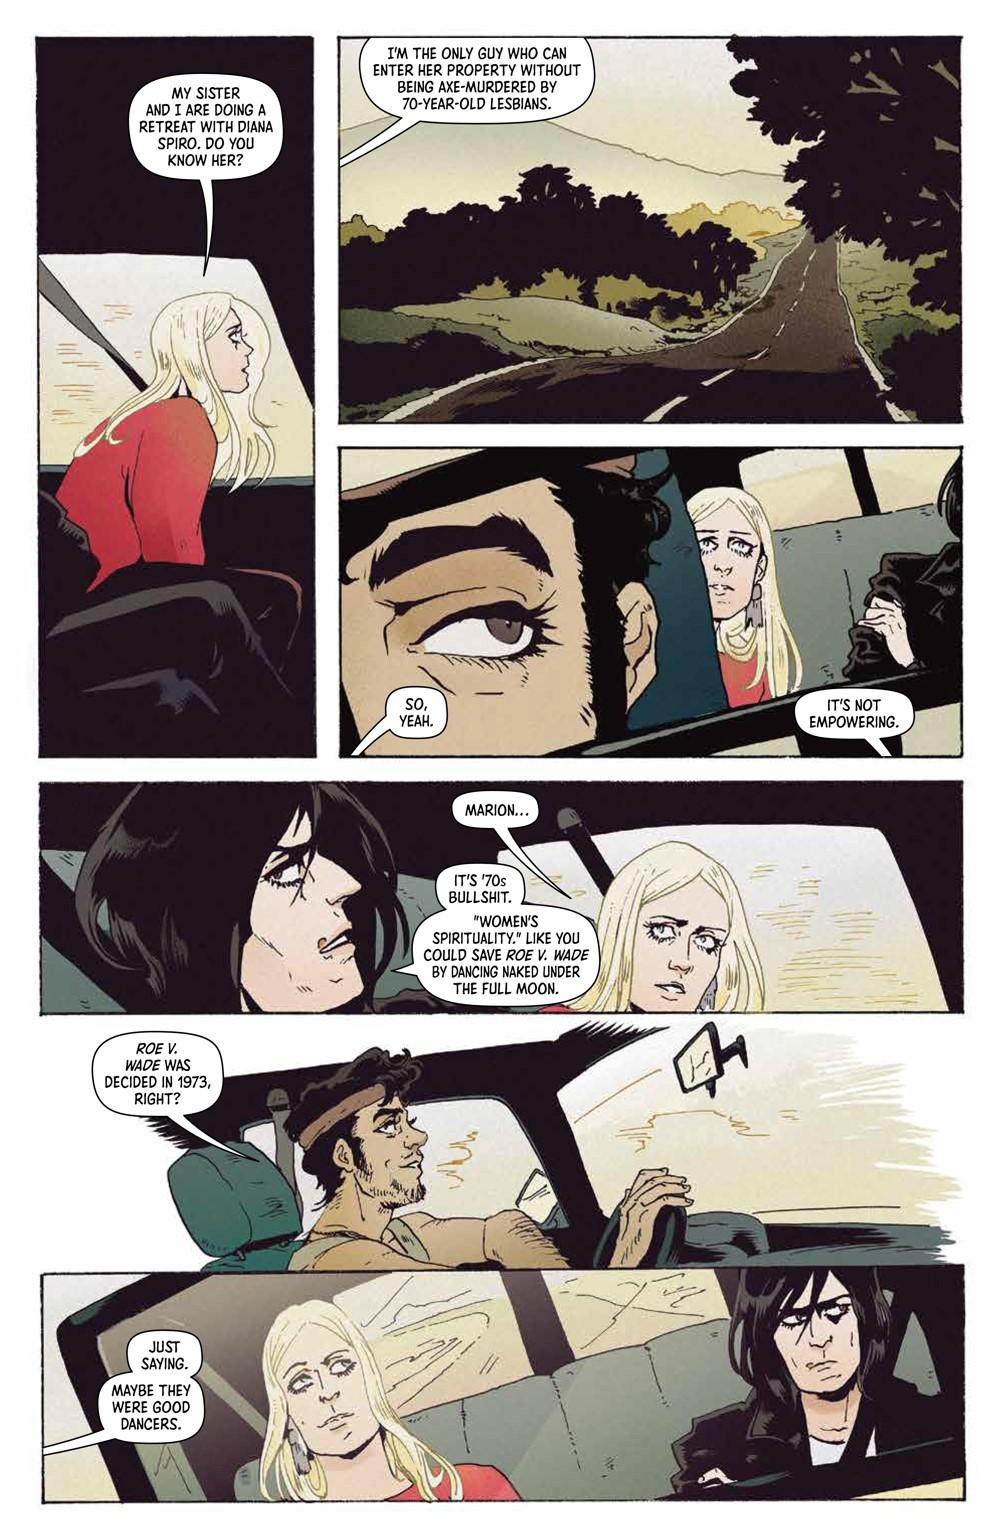 Maw_001_PRESS_5 ComicList Previews: MAW #1 (OF 5)